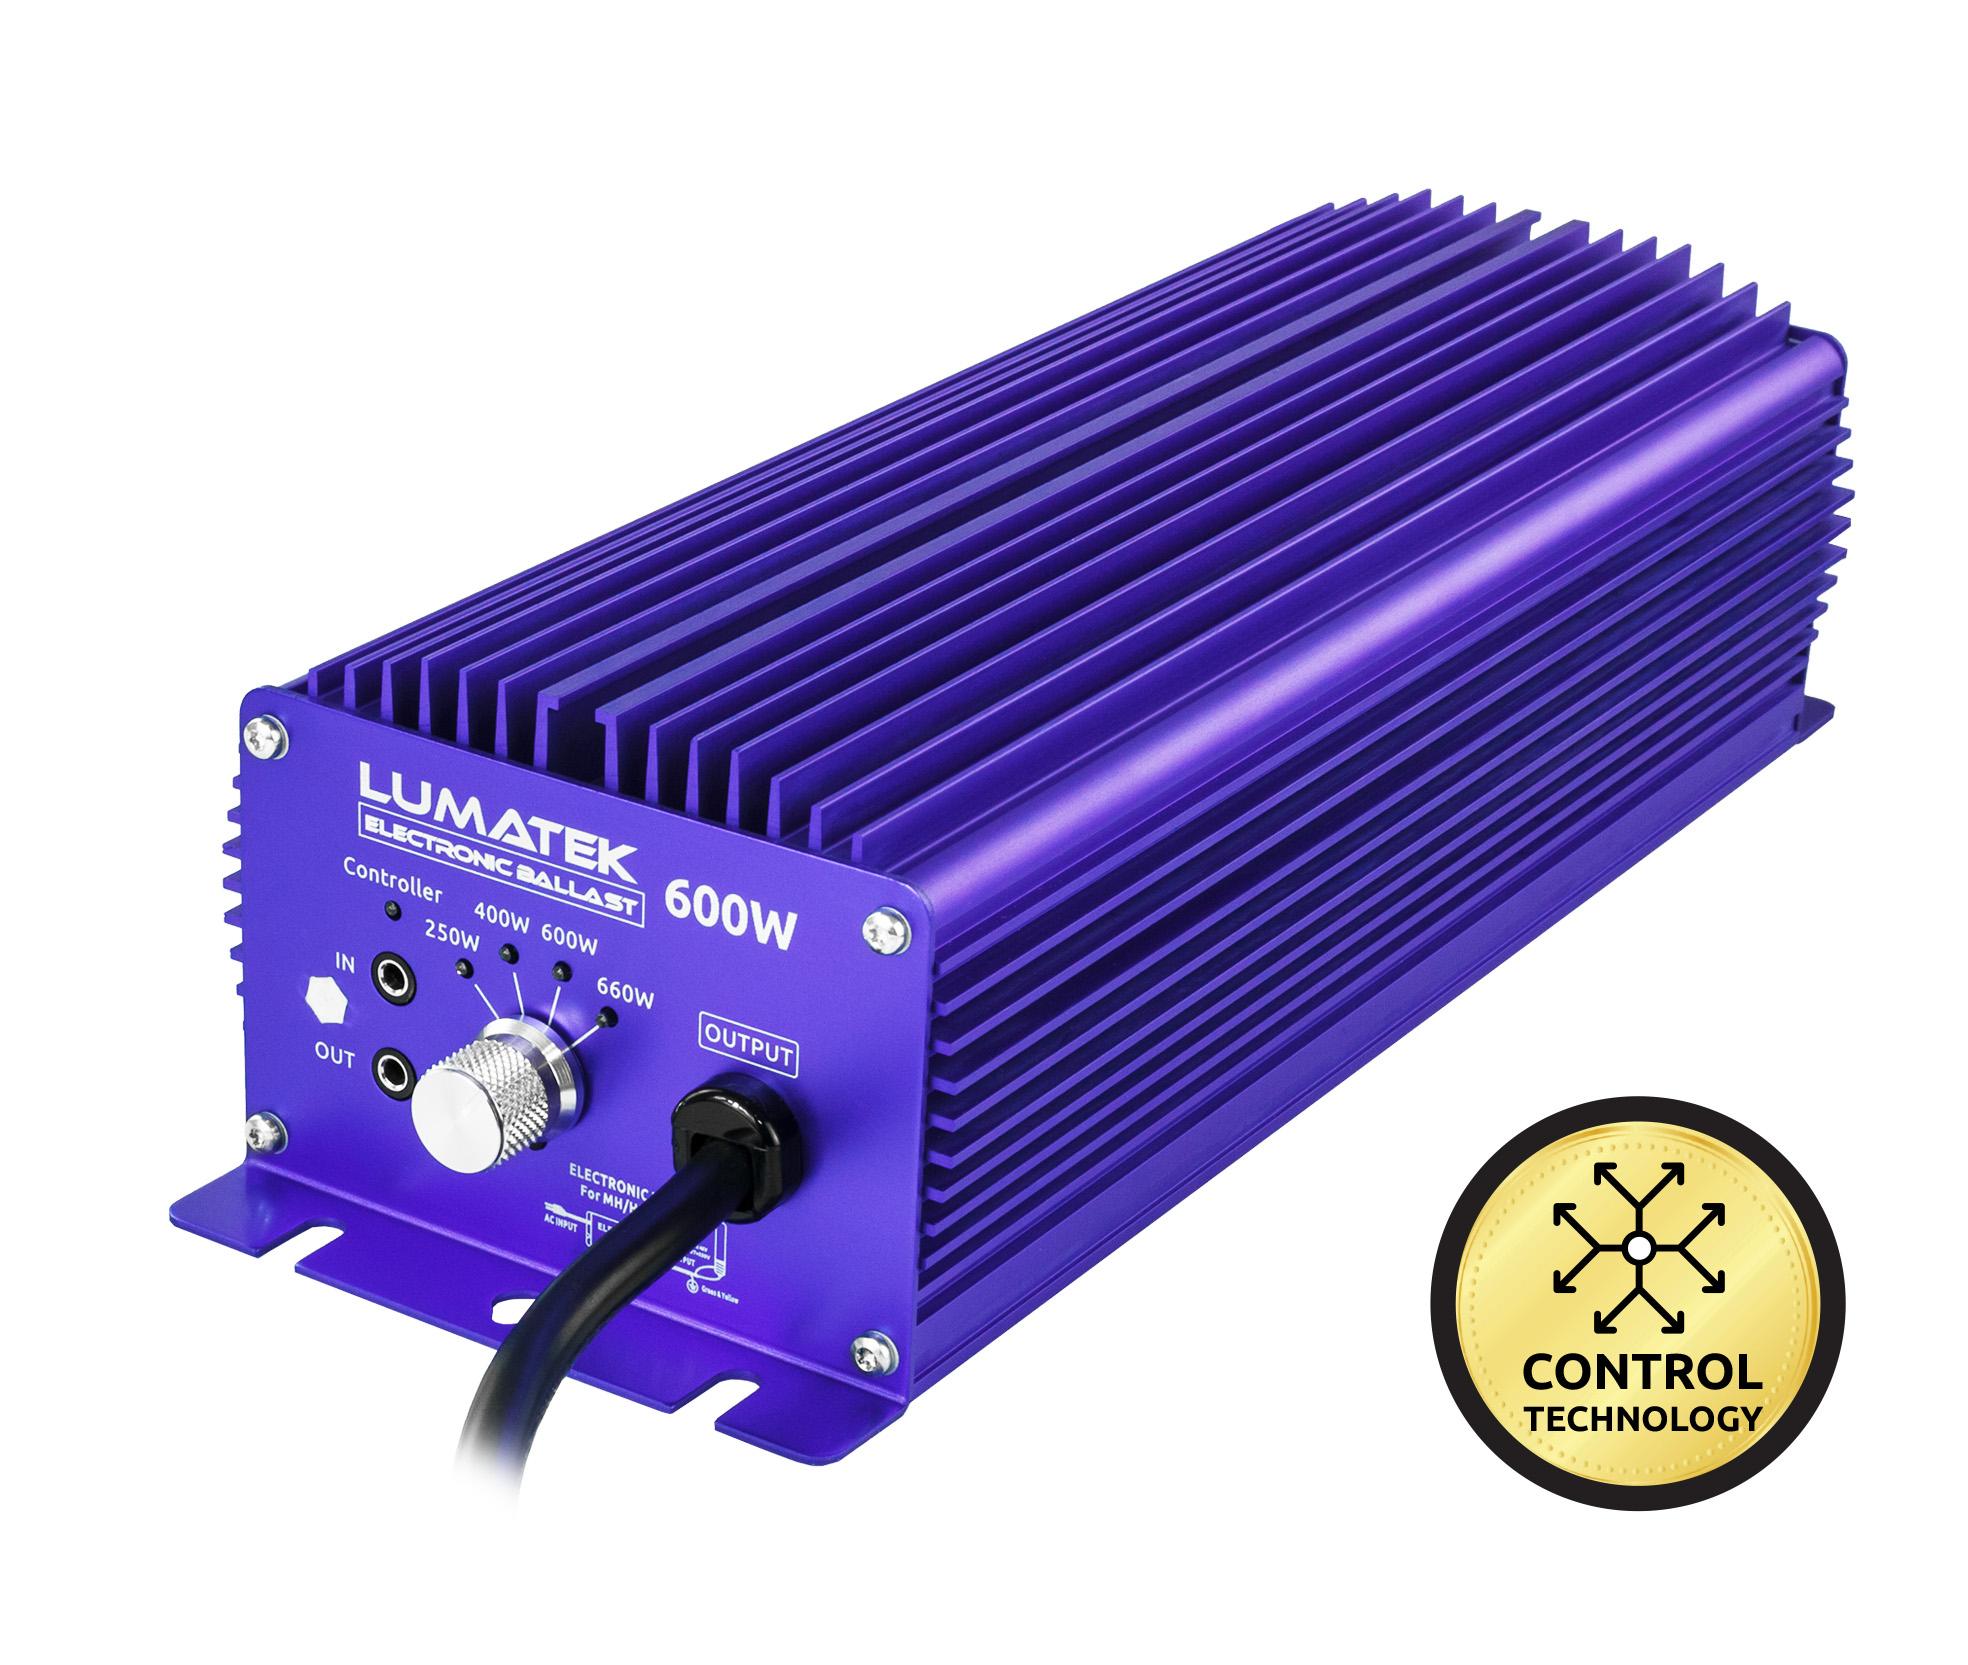 Lumatek Controllable Ballast 600w 240v Electronic Ballast